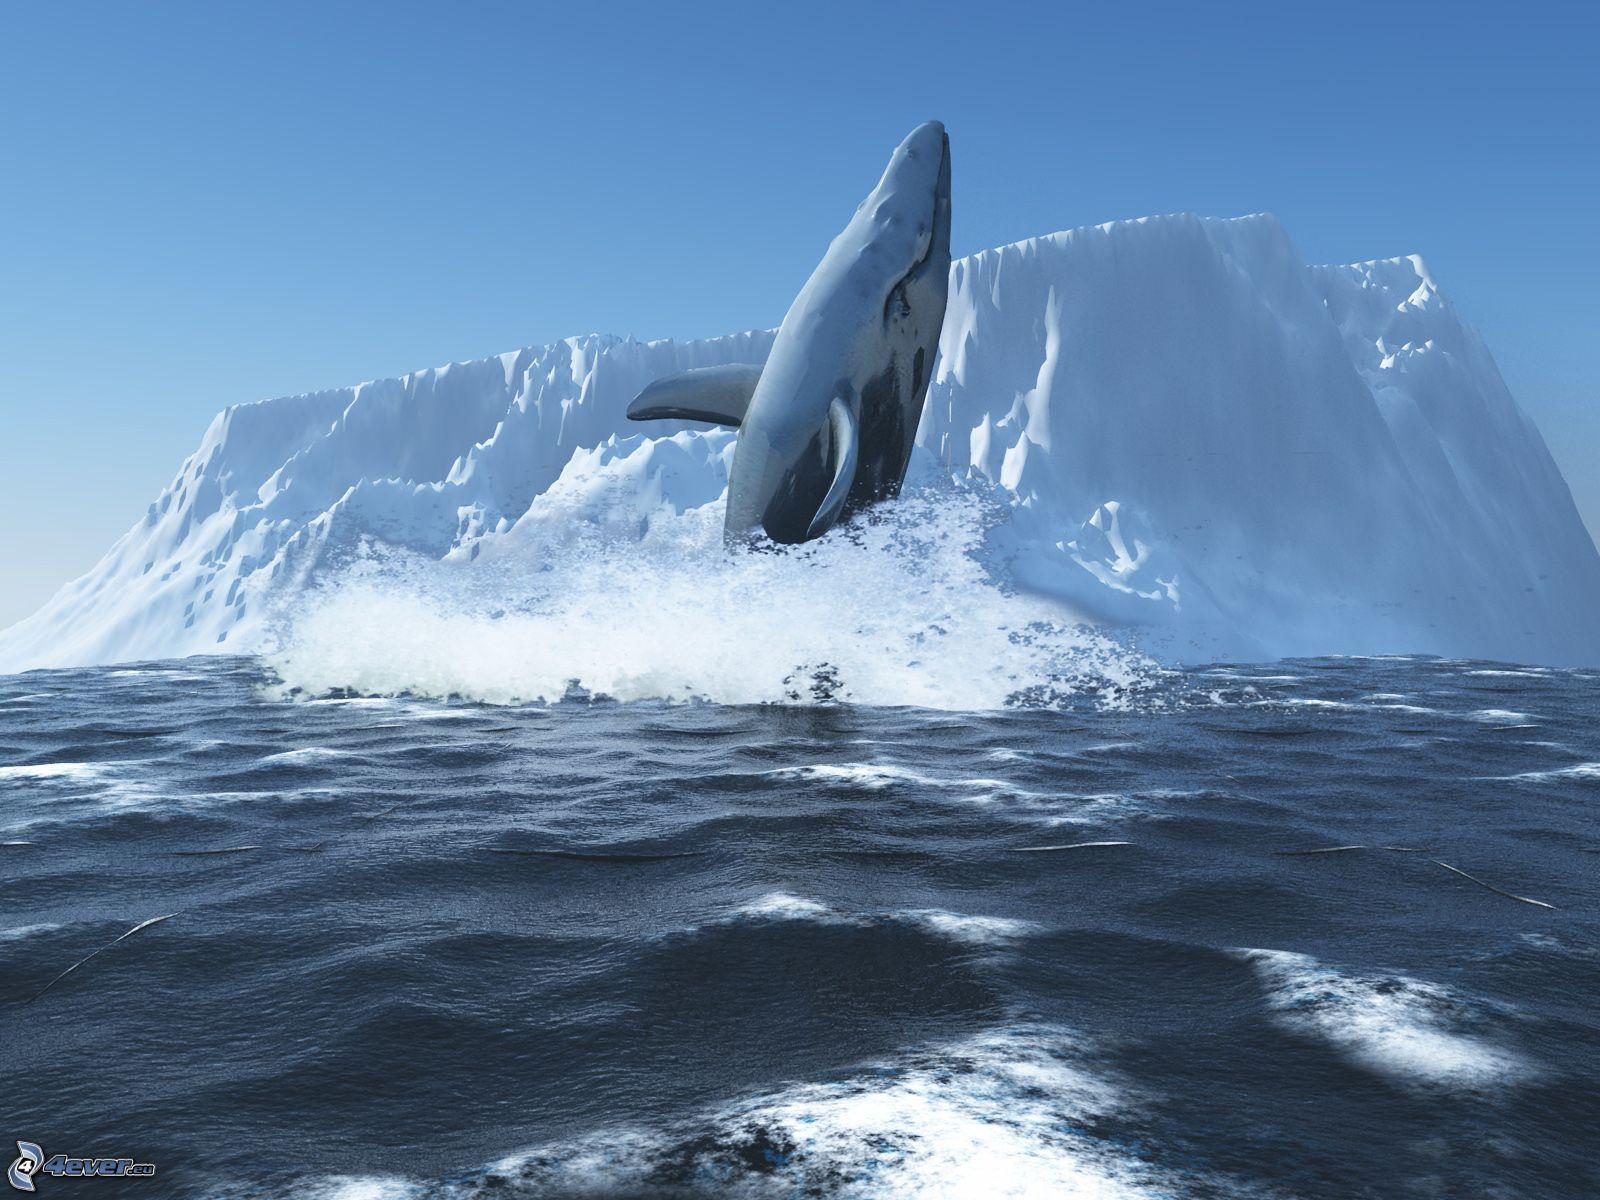 iceberg wallpaper free download